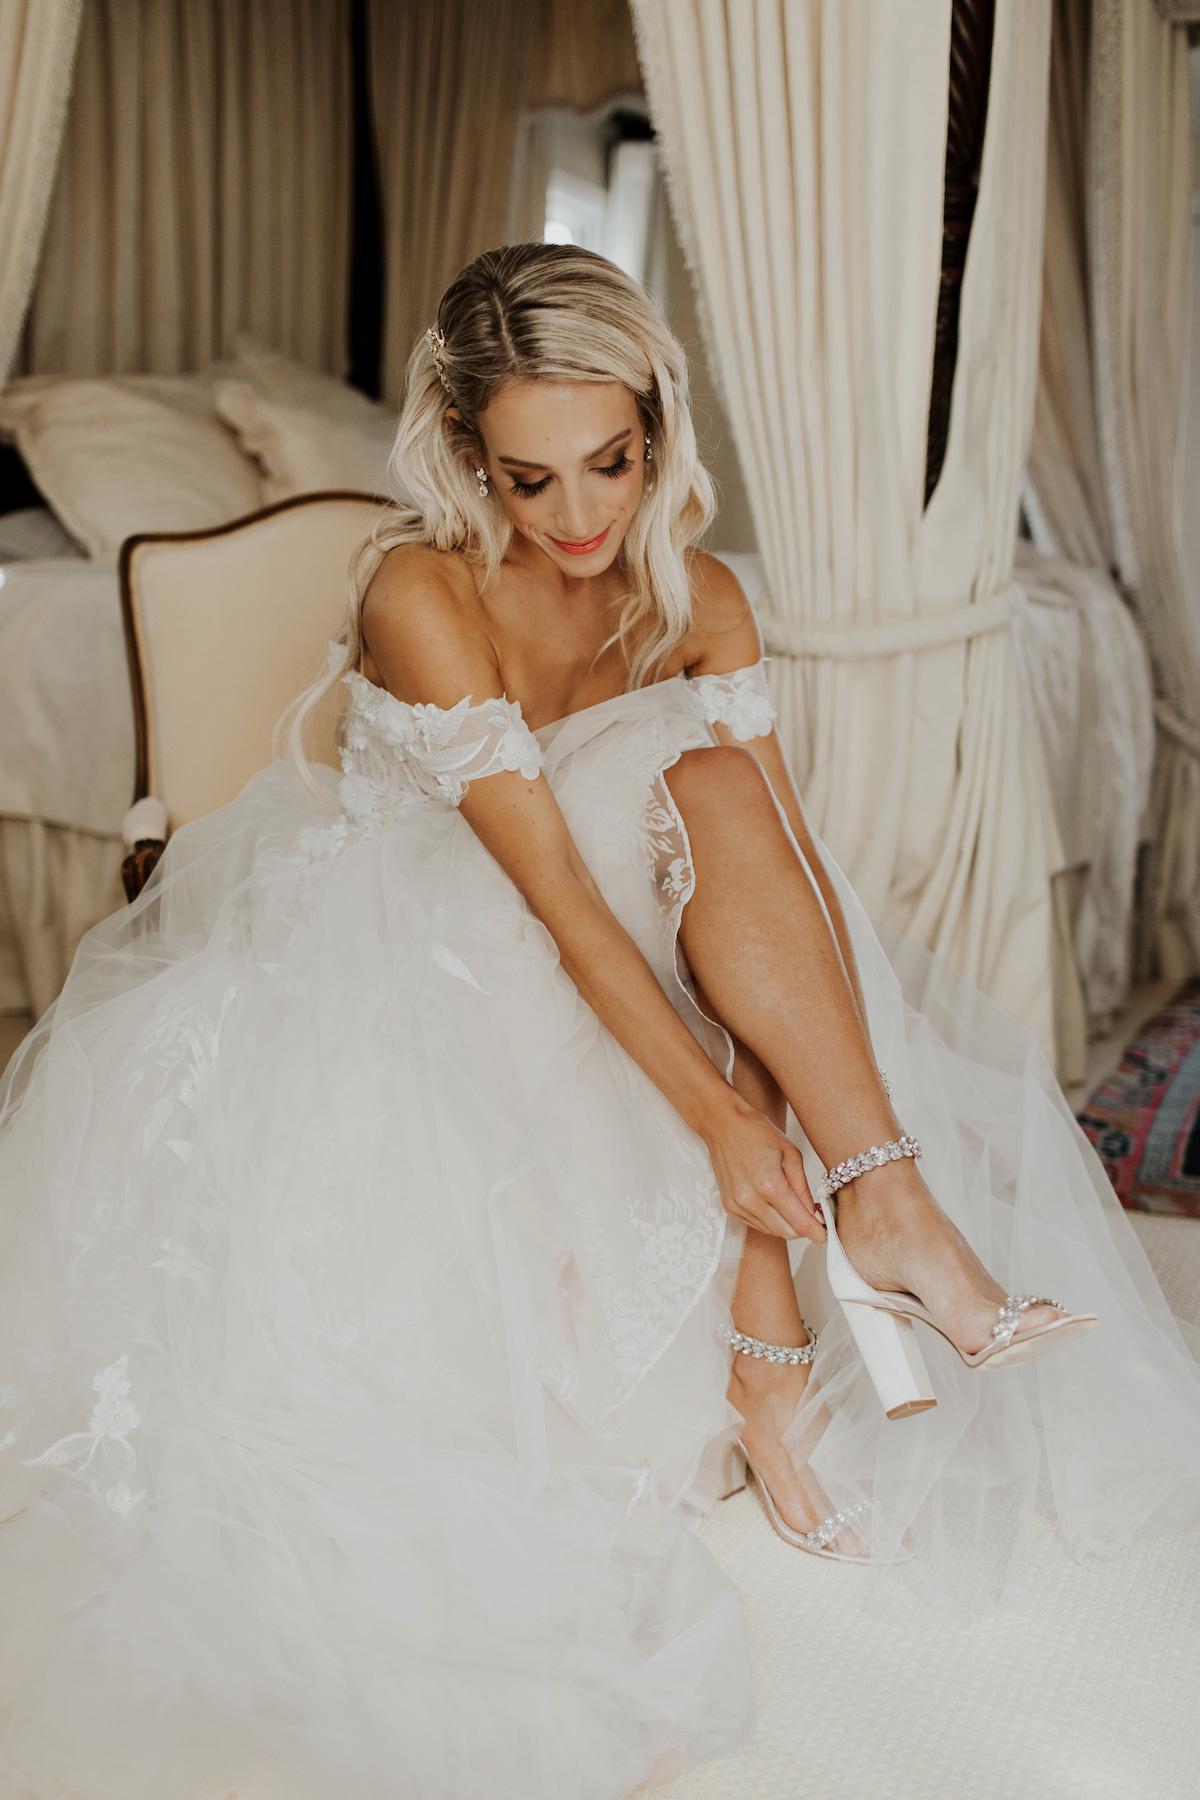 Katies Bliss Riki Dalal Juliet Wedding Gown